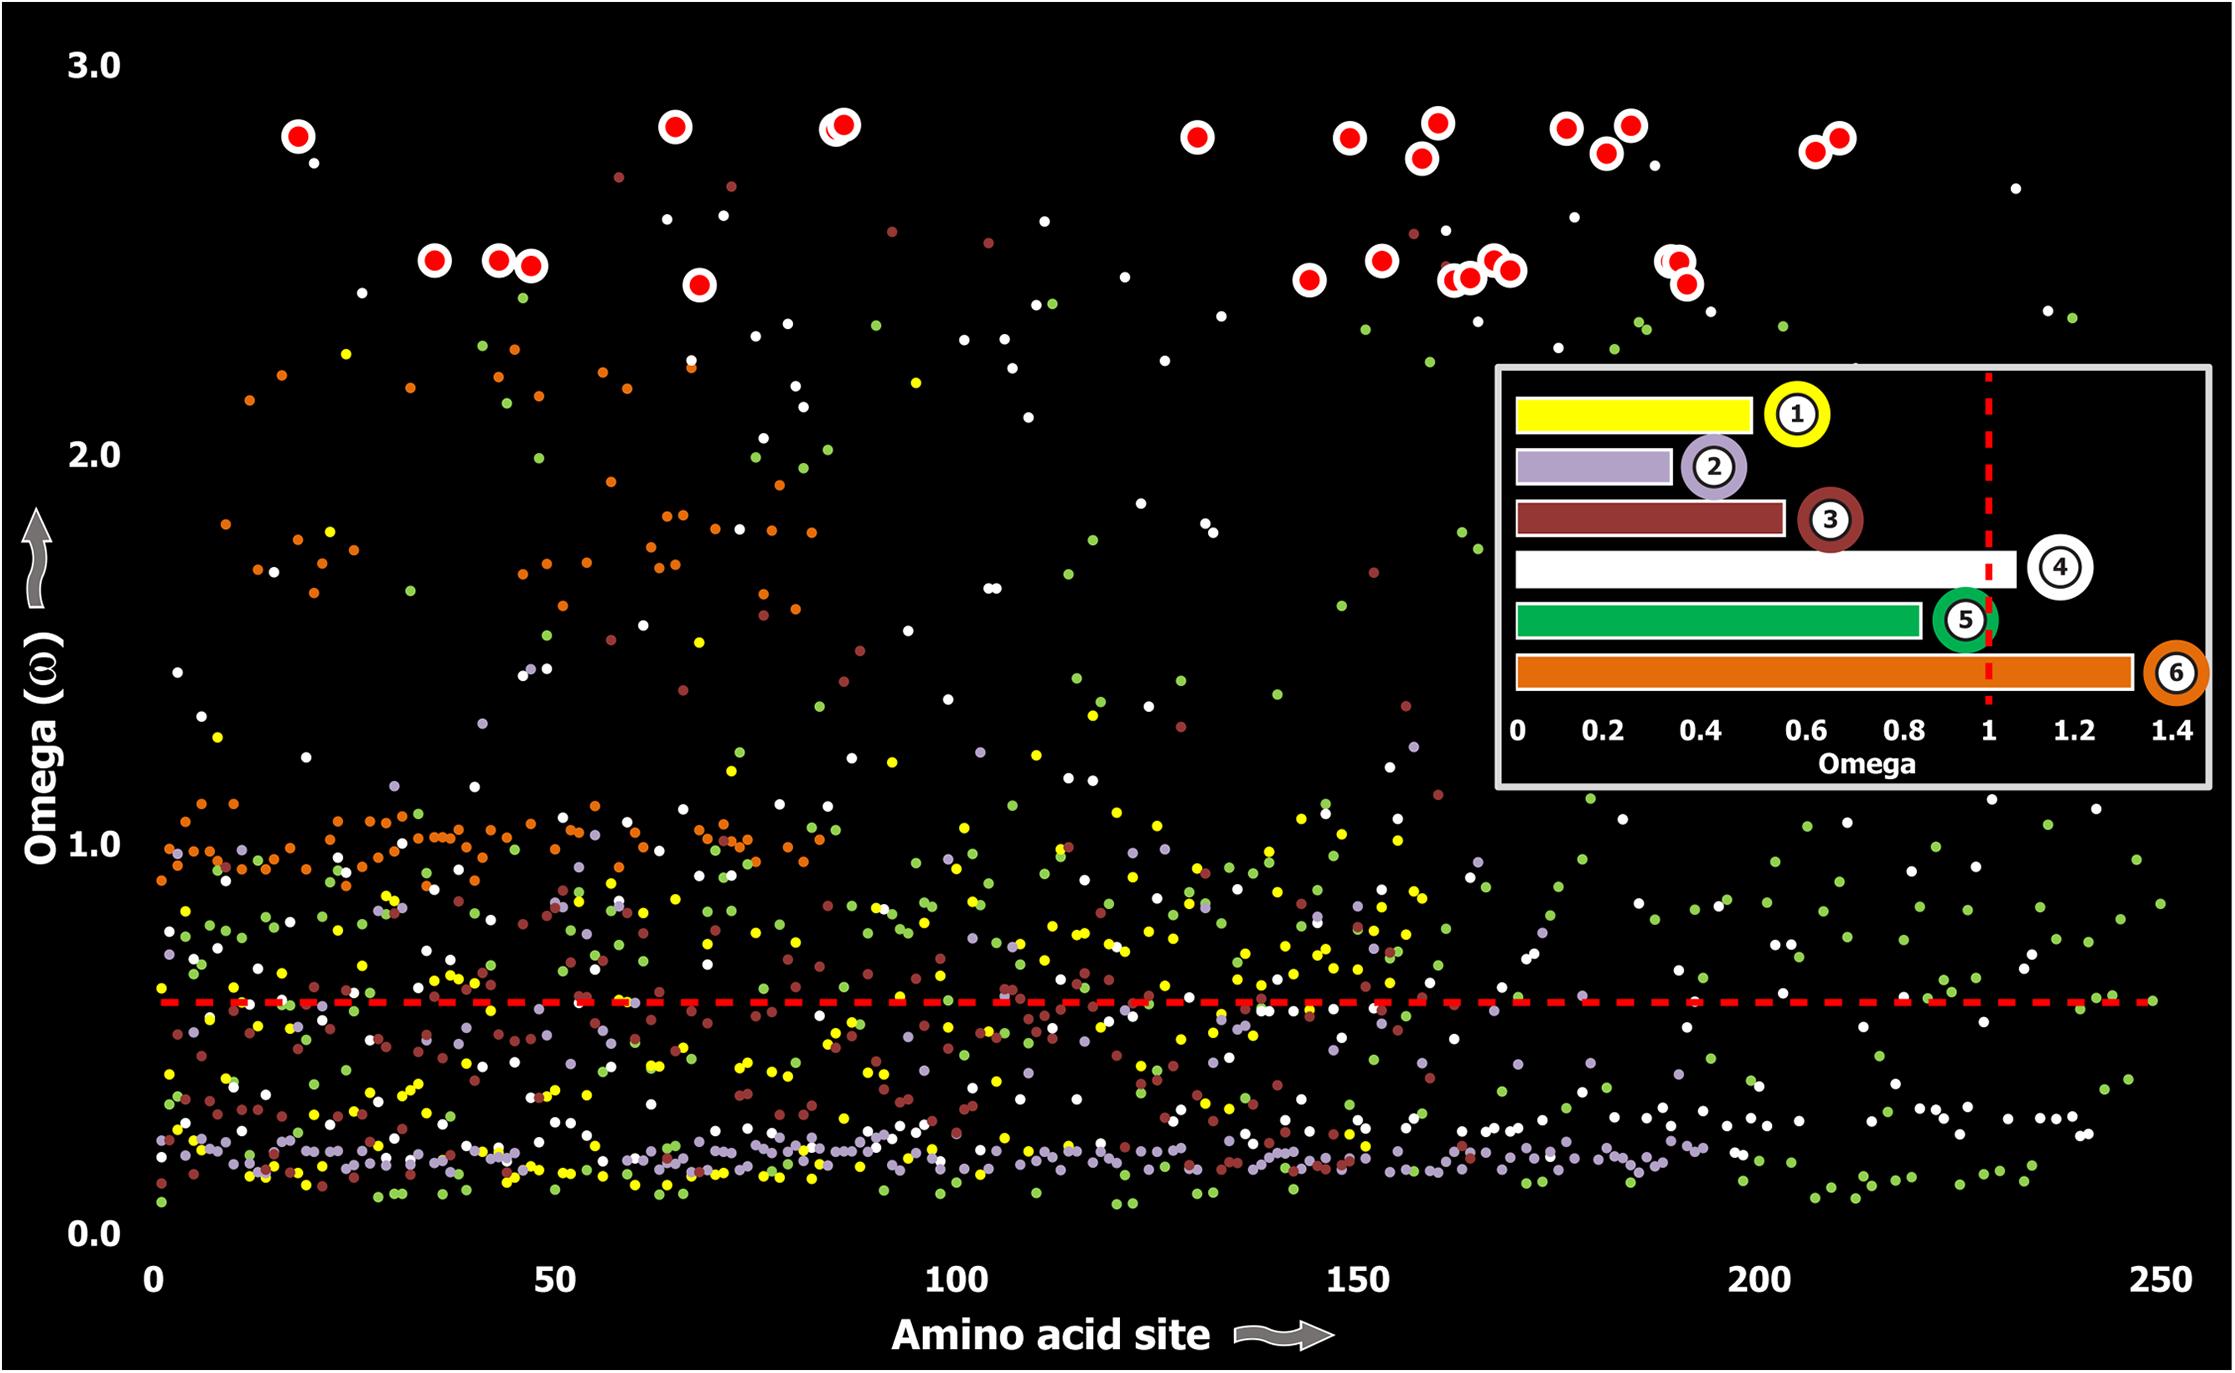 Molecular evolution of venom in Toxicofera lizards.